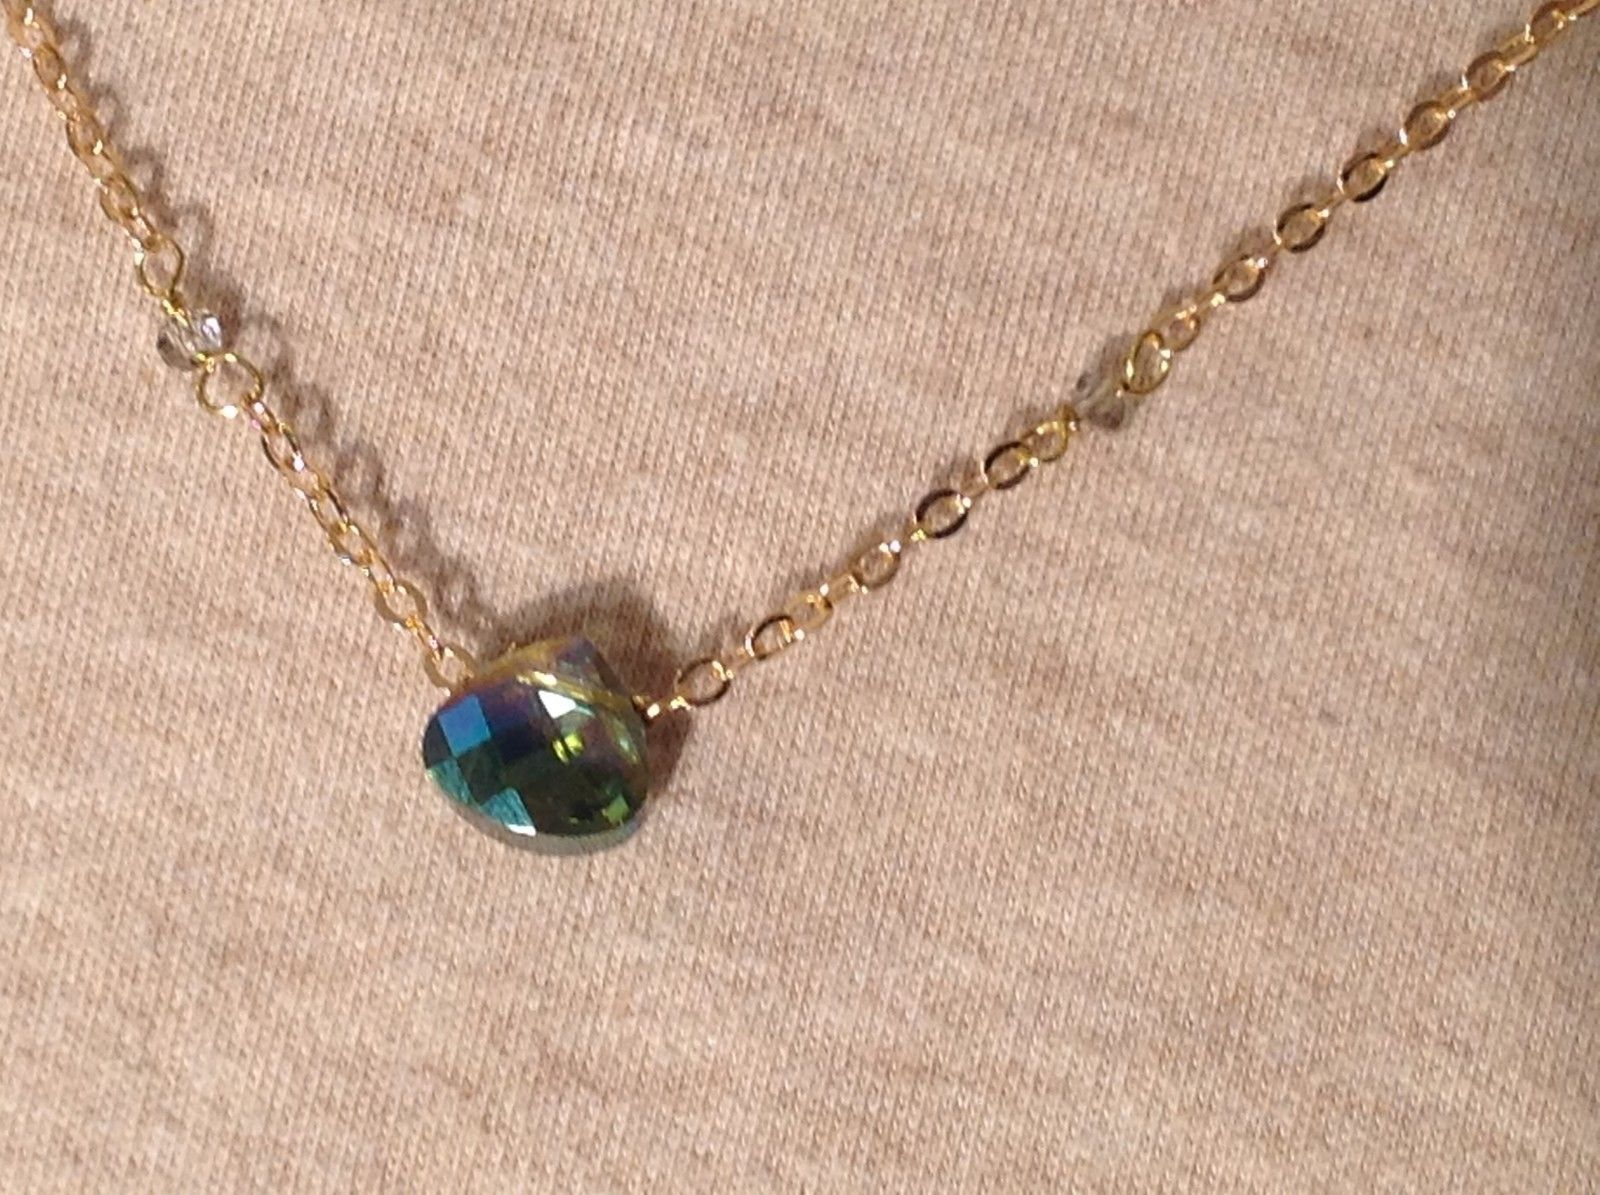 "Caribbean aqua blue Elly Preston Faceted Thai Crystal Pendant Necklace 22"" Long"